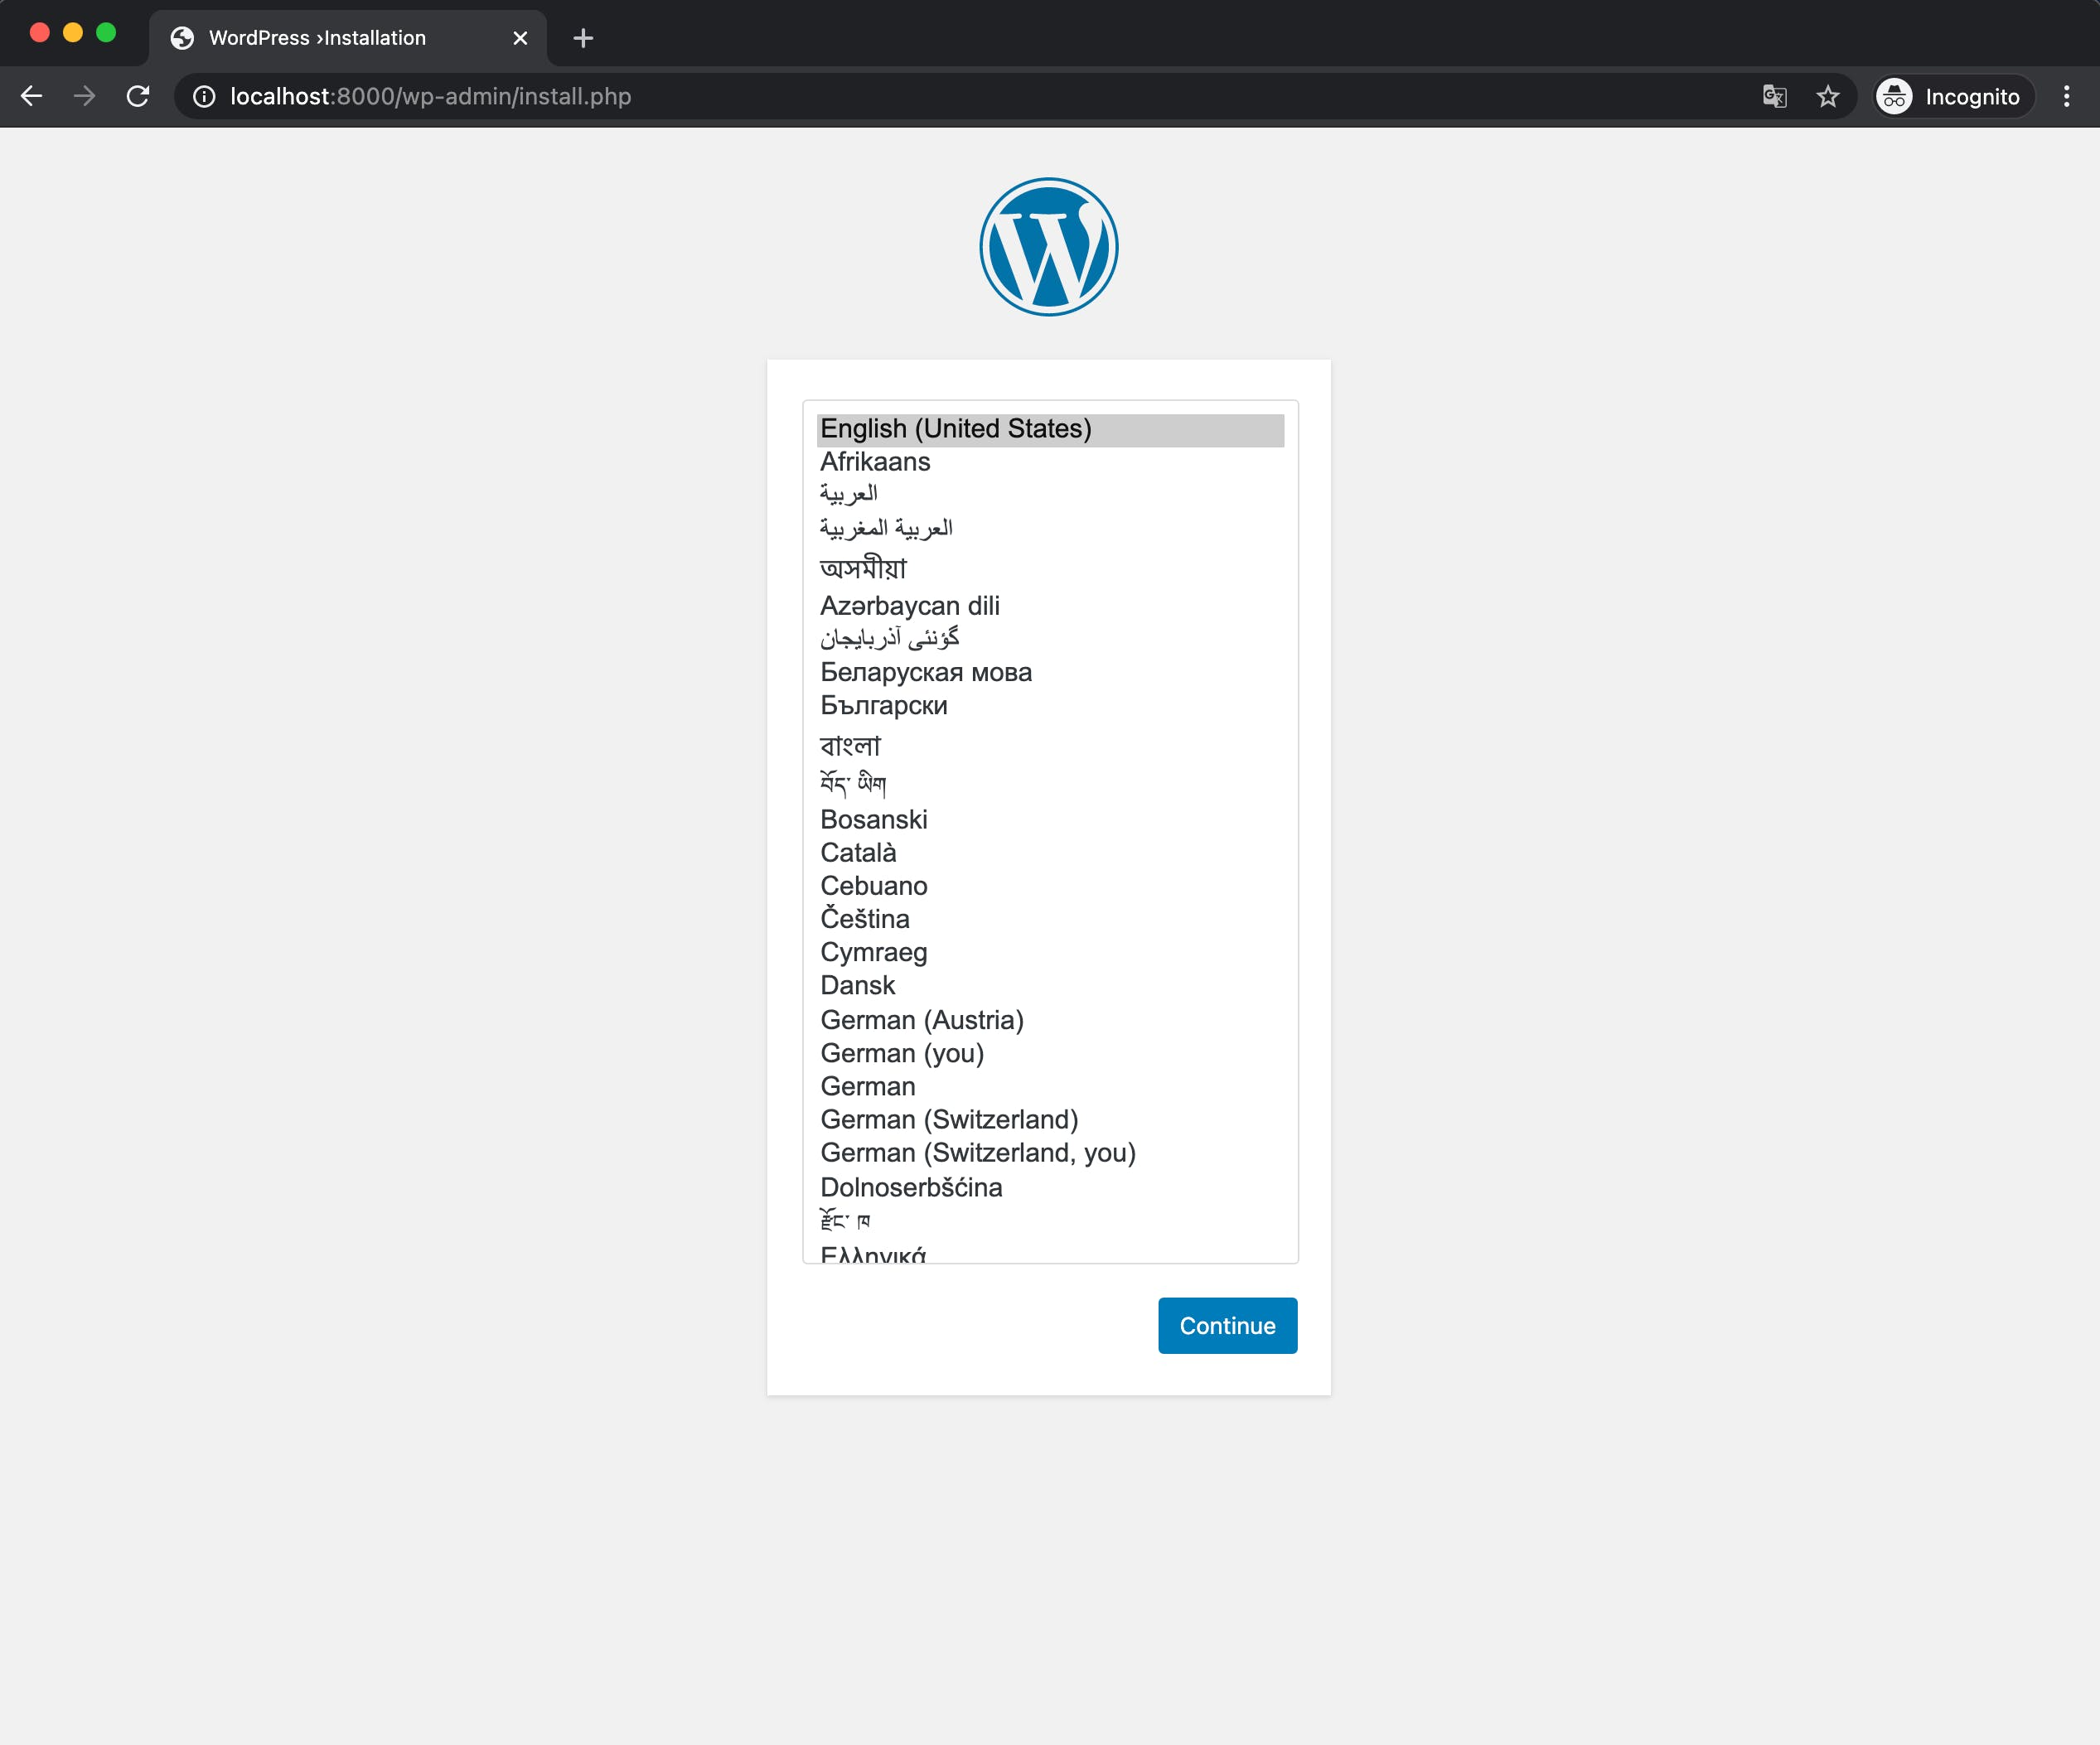 wordpress-install.png